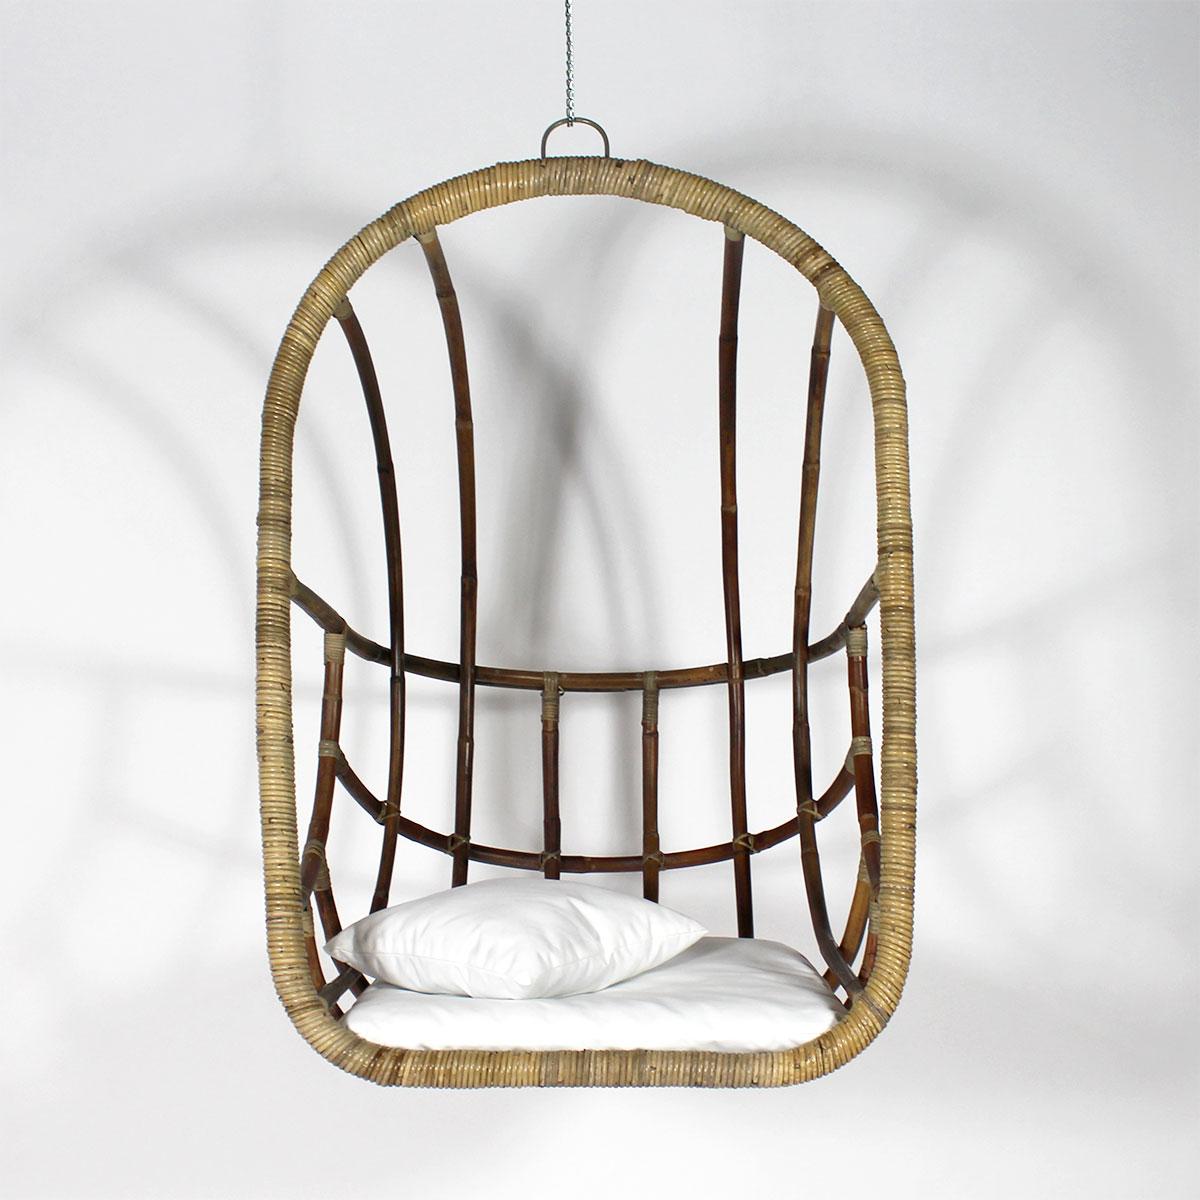 vdl90 fauteuil suspendu tendance